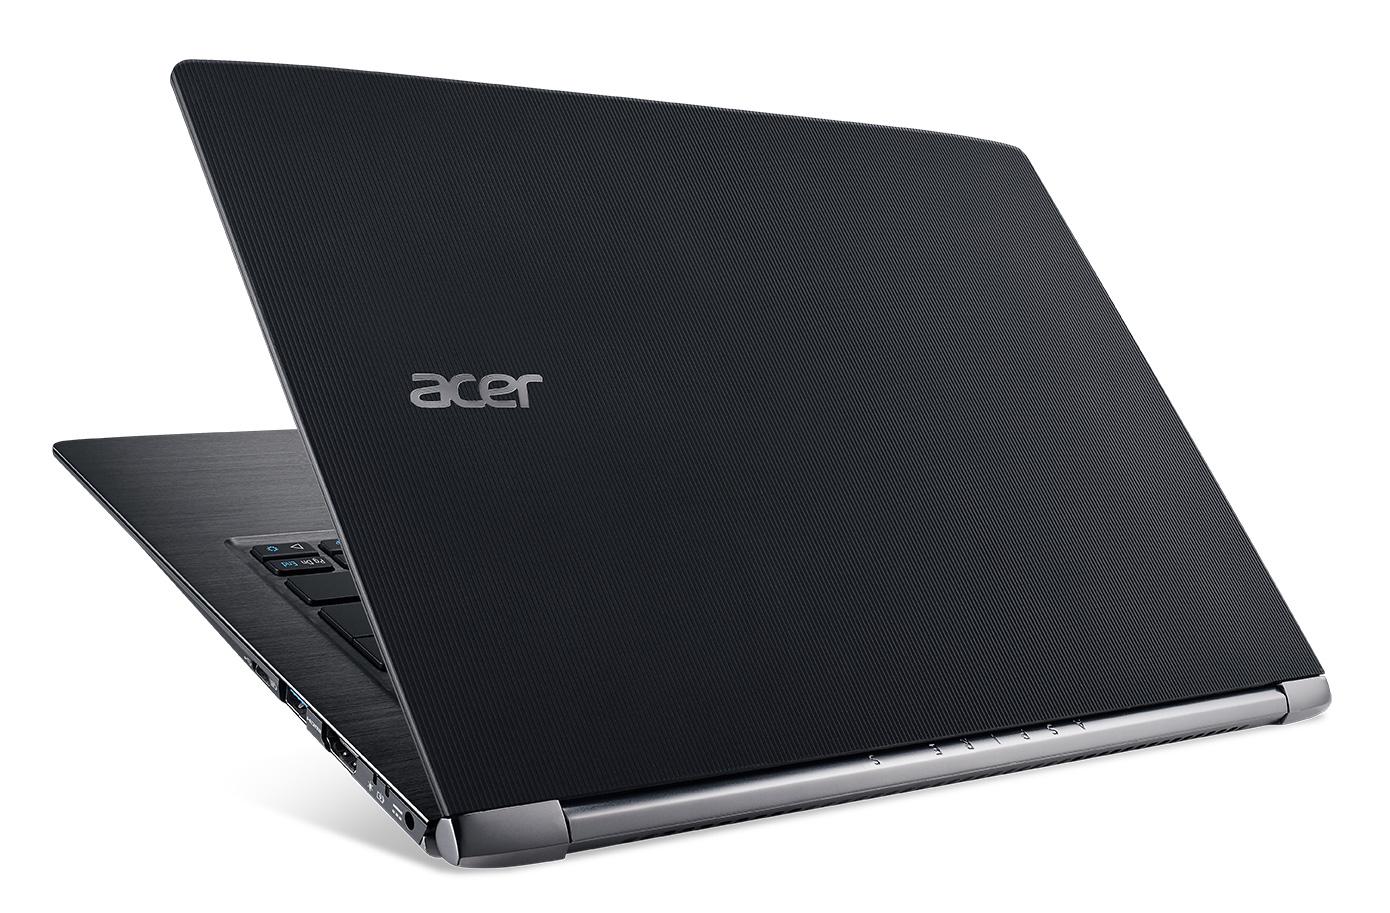 "<span class=""toptagtitre"">Promo 799€ ! </span>Acer Aspire S5-371-735X, ultrabook 13 pouces SSD512 Core i7 8Go"